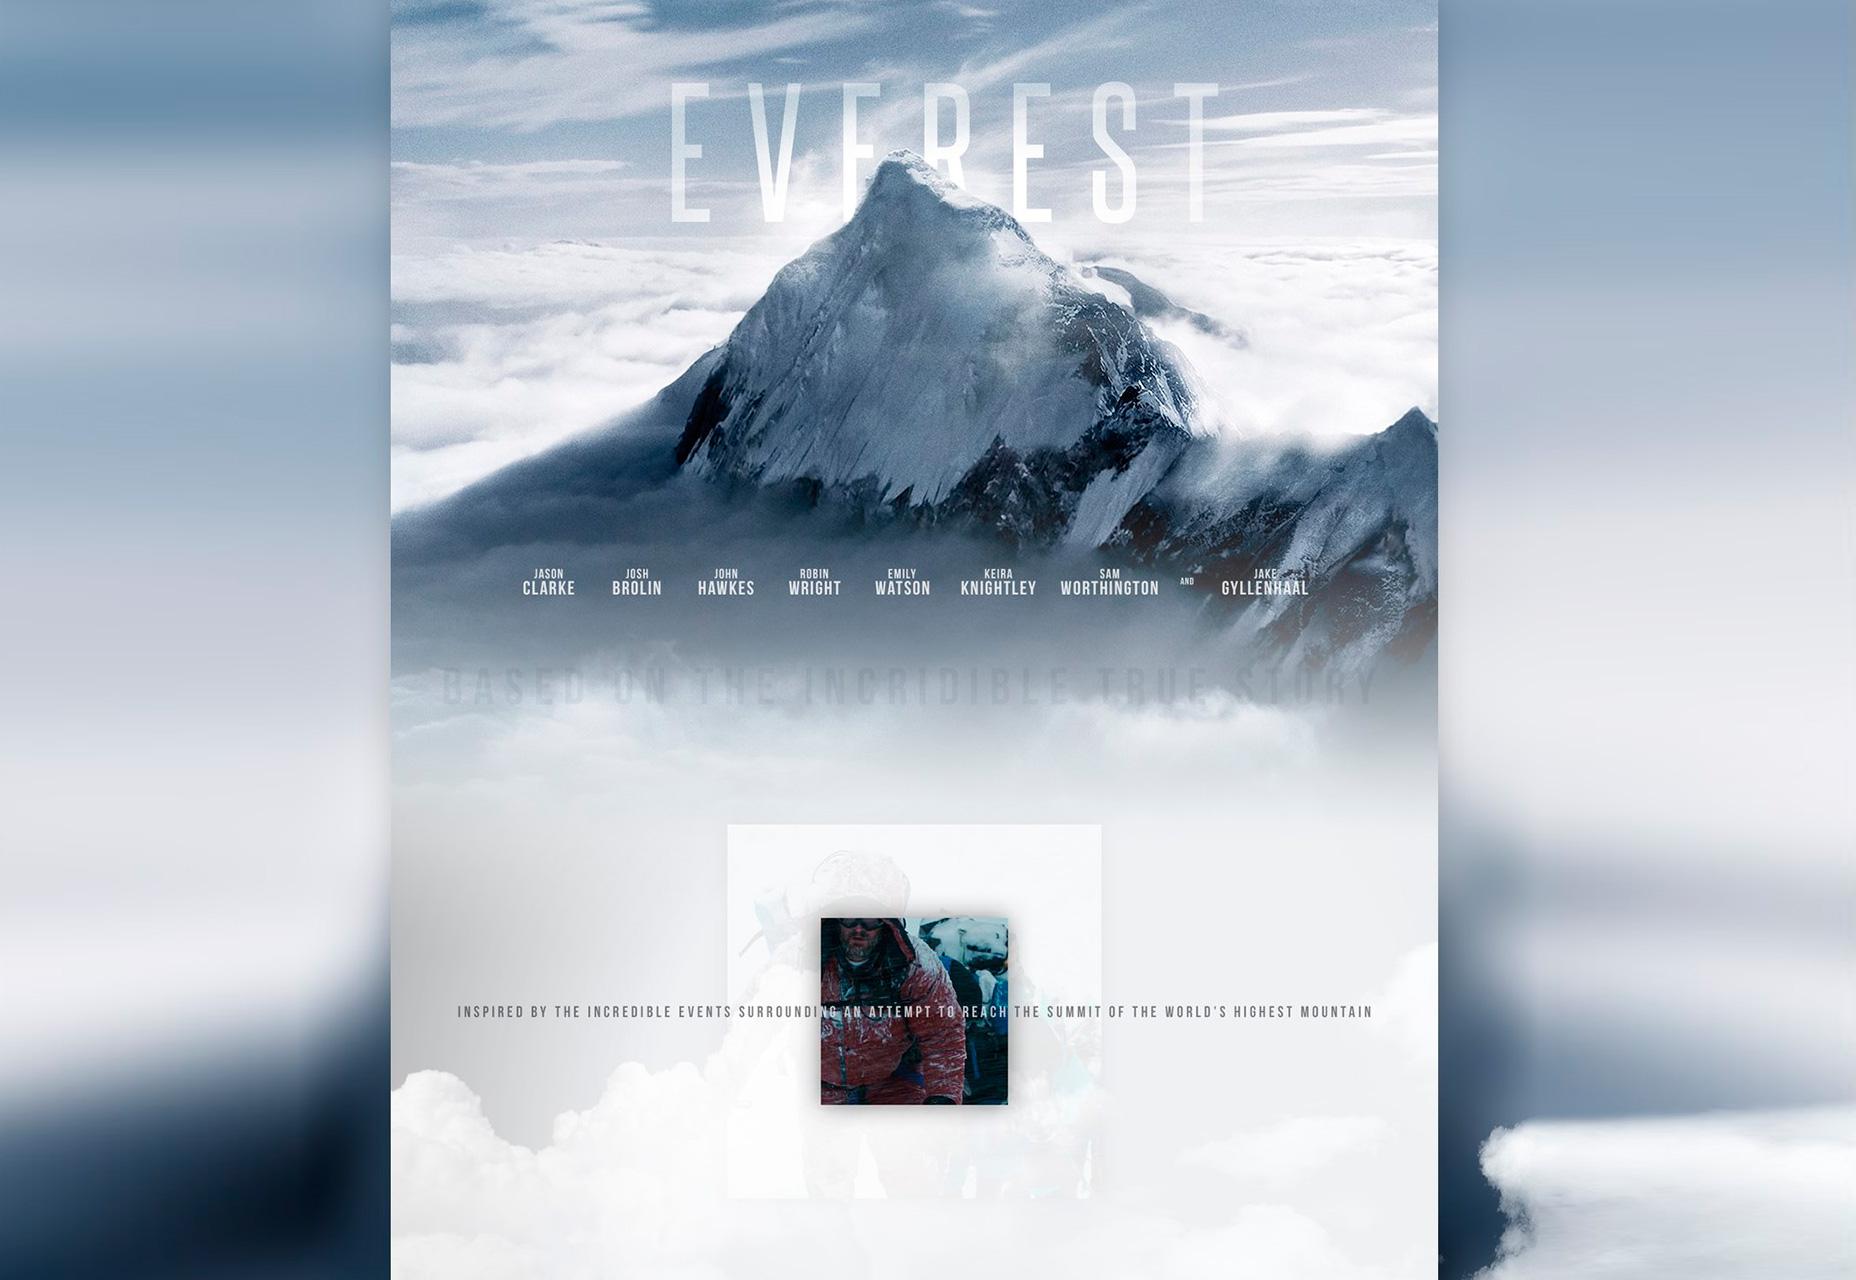 Everest: plantilla web PSD inspirada en la película